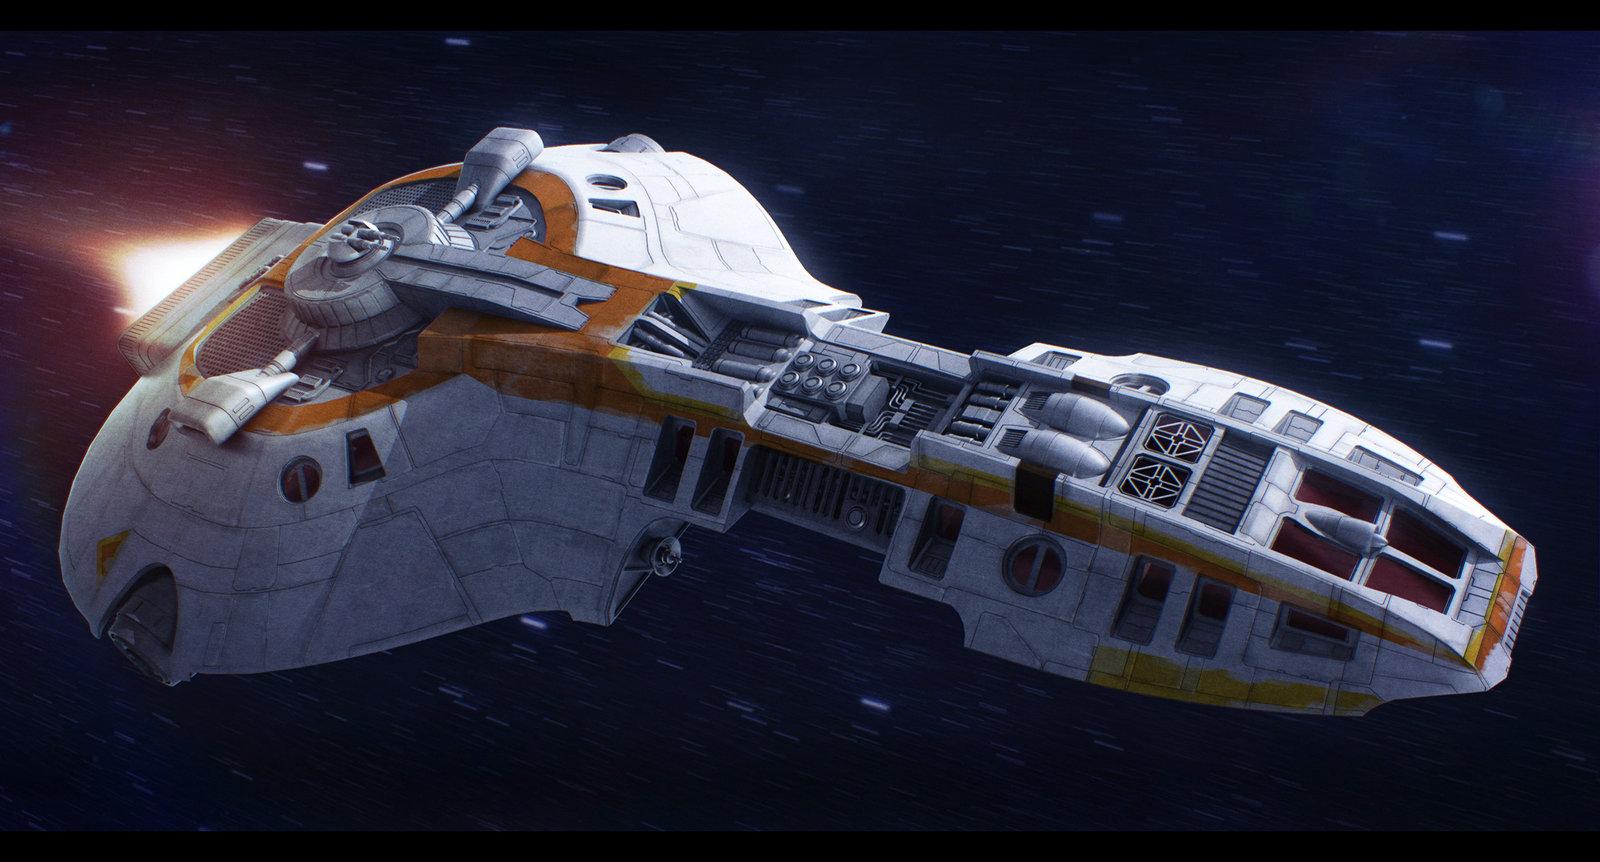 star_wars_e_9_loronar_explorer_by_adamkop-da0il8q.jpg